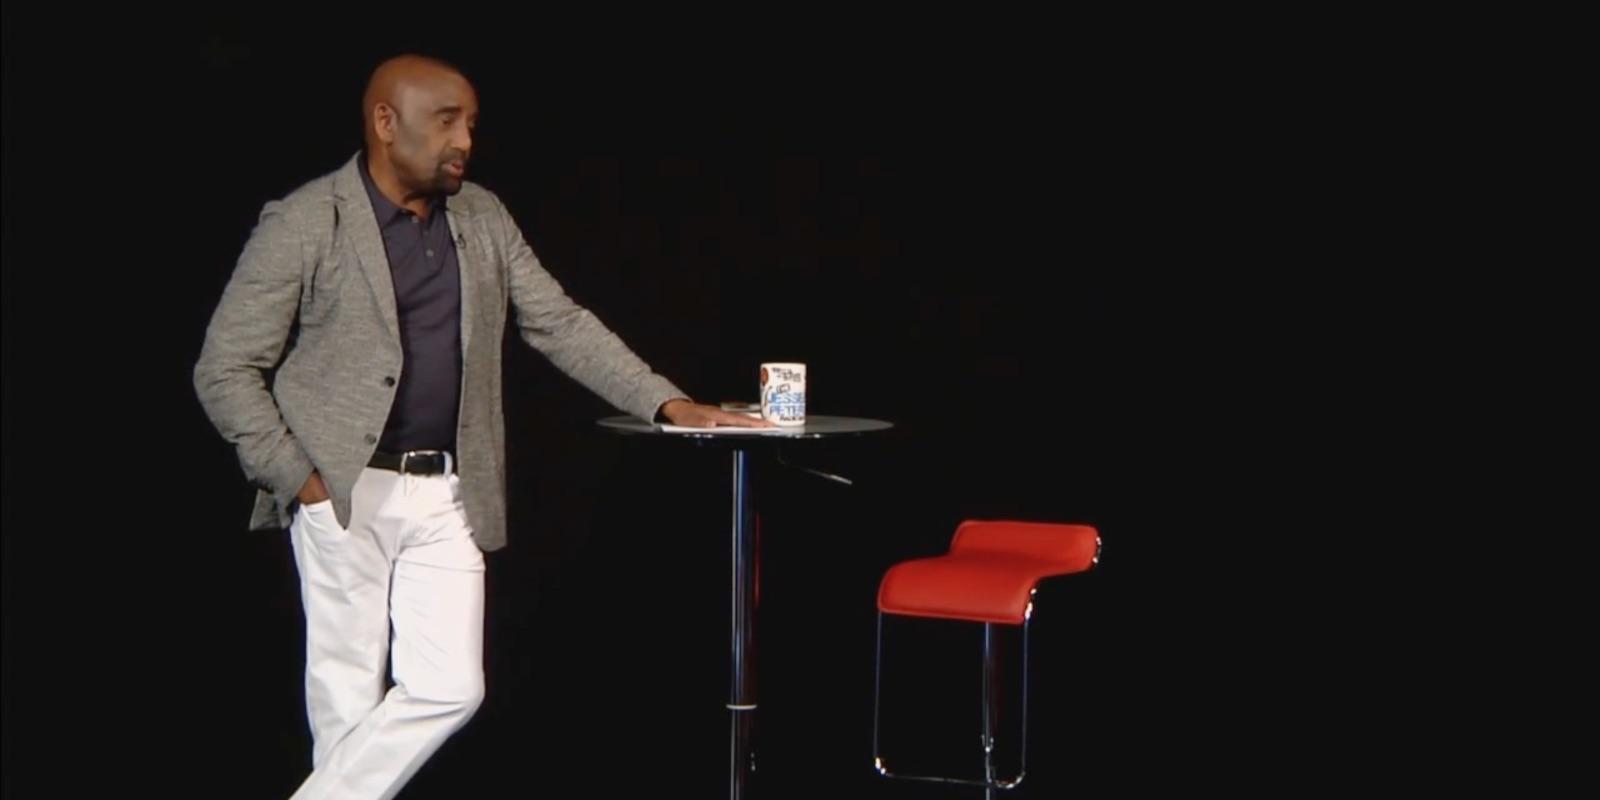 Jesse explains about anger